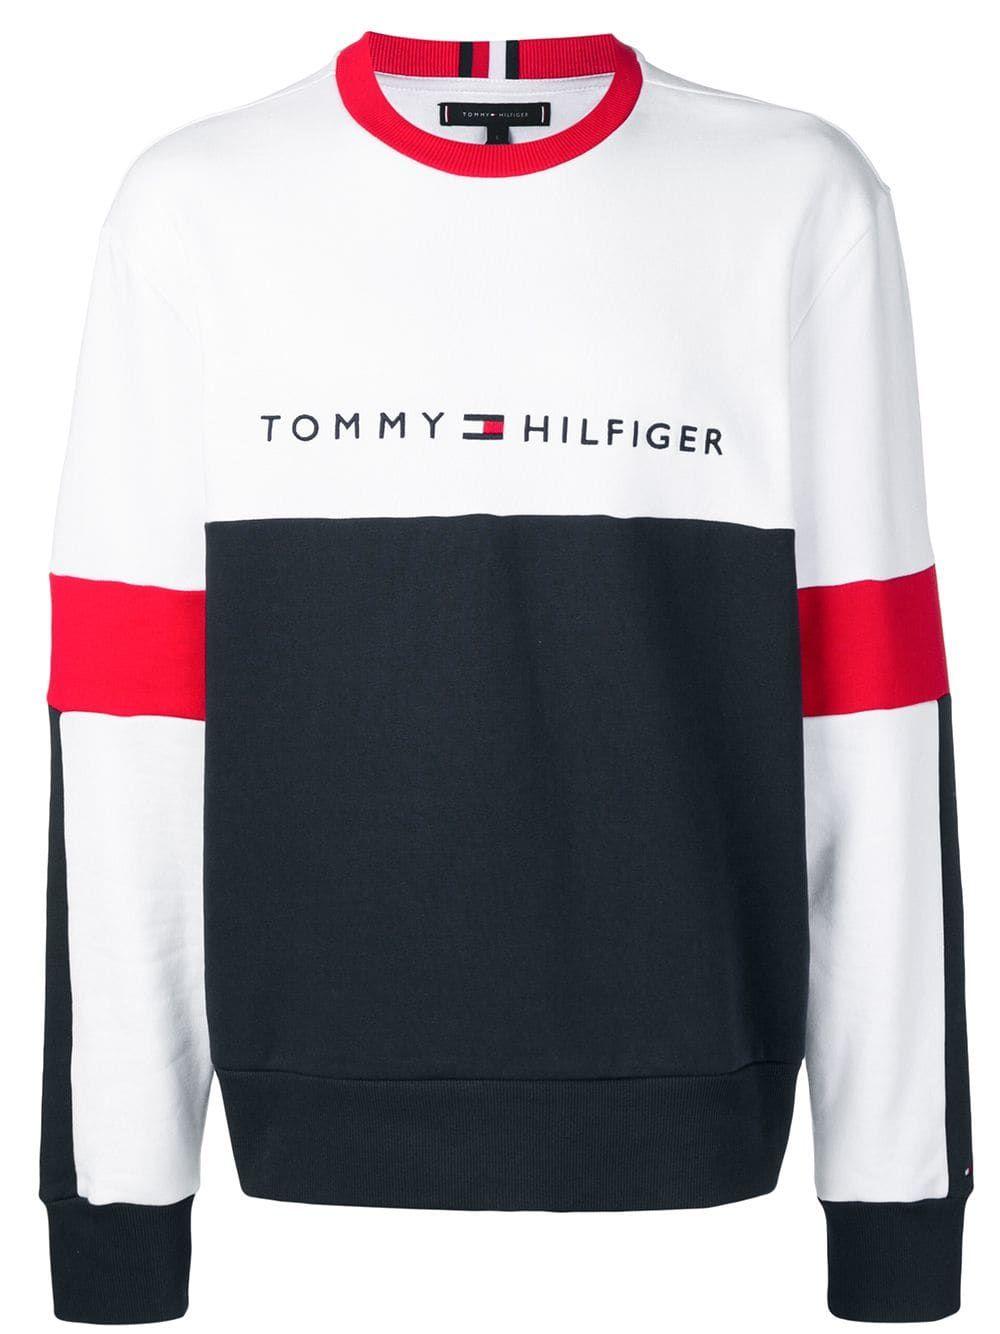 Tommy Hilfiger Tommy Hilfiger Logo Embroidered Sweatshirt Blue Tommyhilfiger Cloth Embroidered Sweatshirts Tommy Hilfiger Sweatshirt Mens Sweatshirts [ 1334 x 1000 Pixel ]